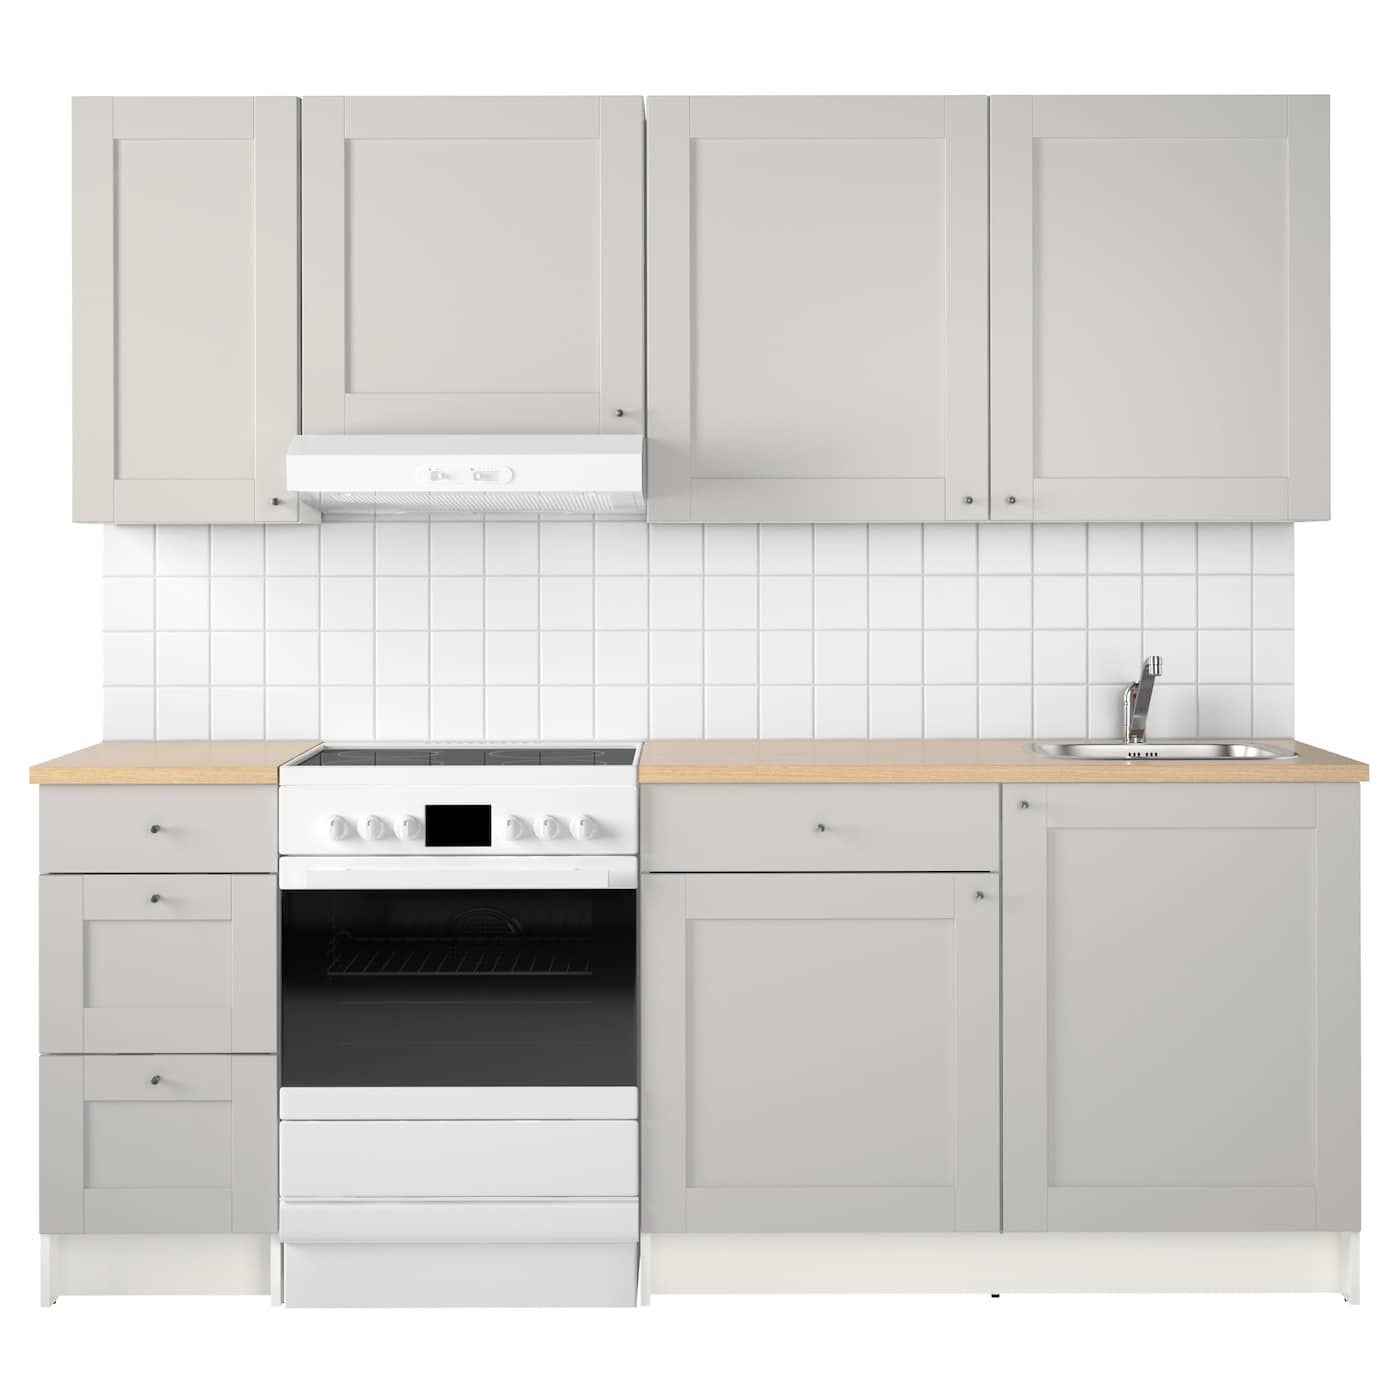 Knoxhult Kuche Grau Schrank Kuche Kuchenschrank Ikea Ikea Kuchenideen